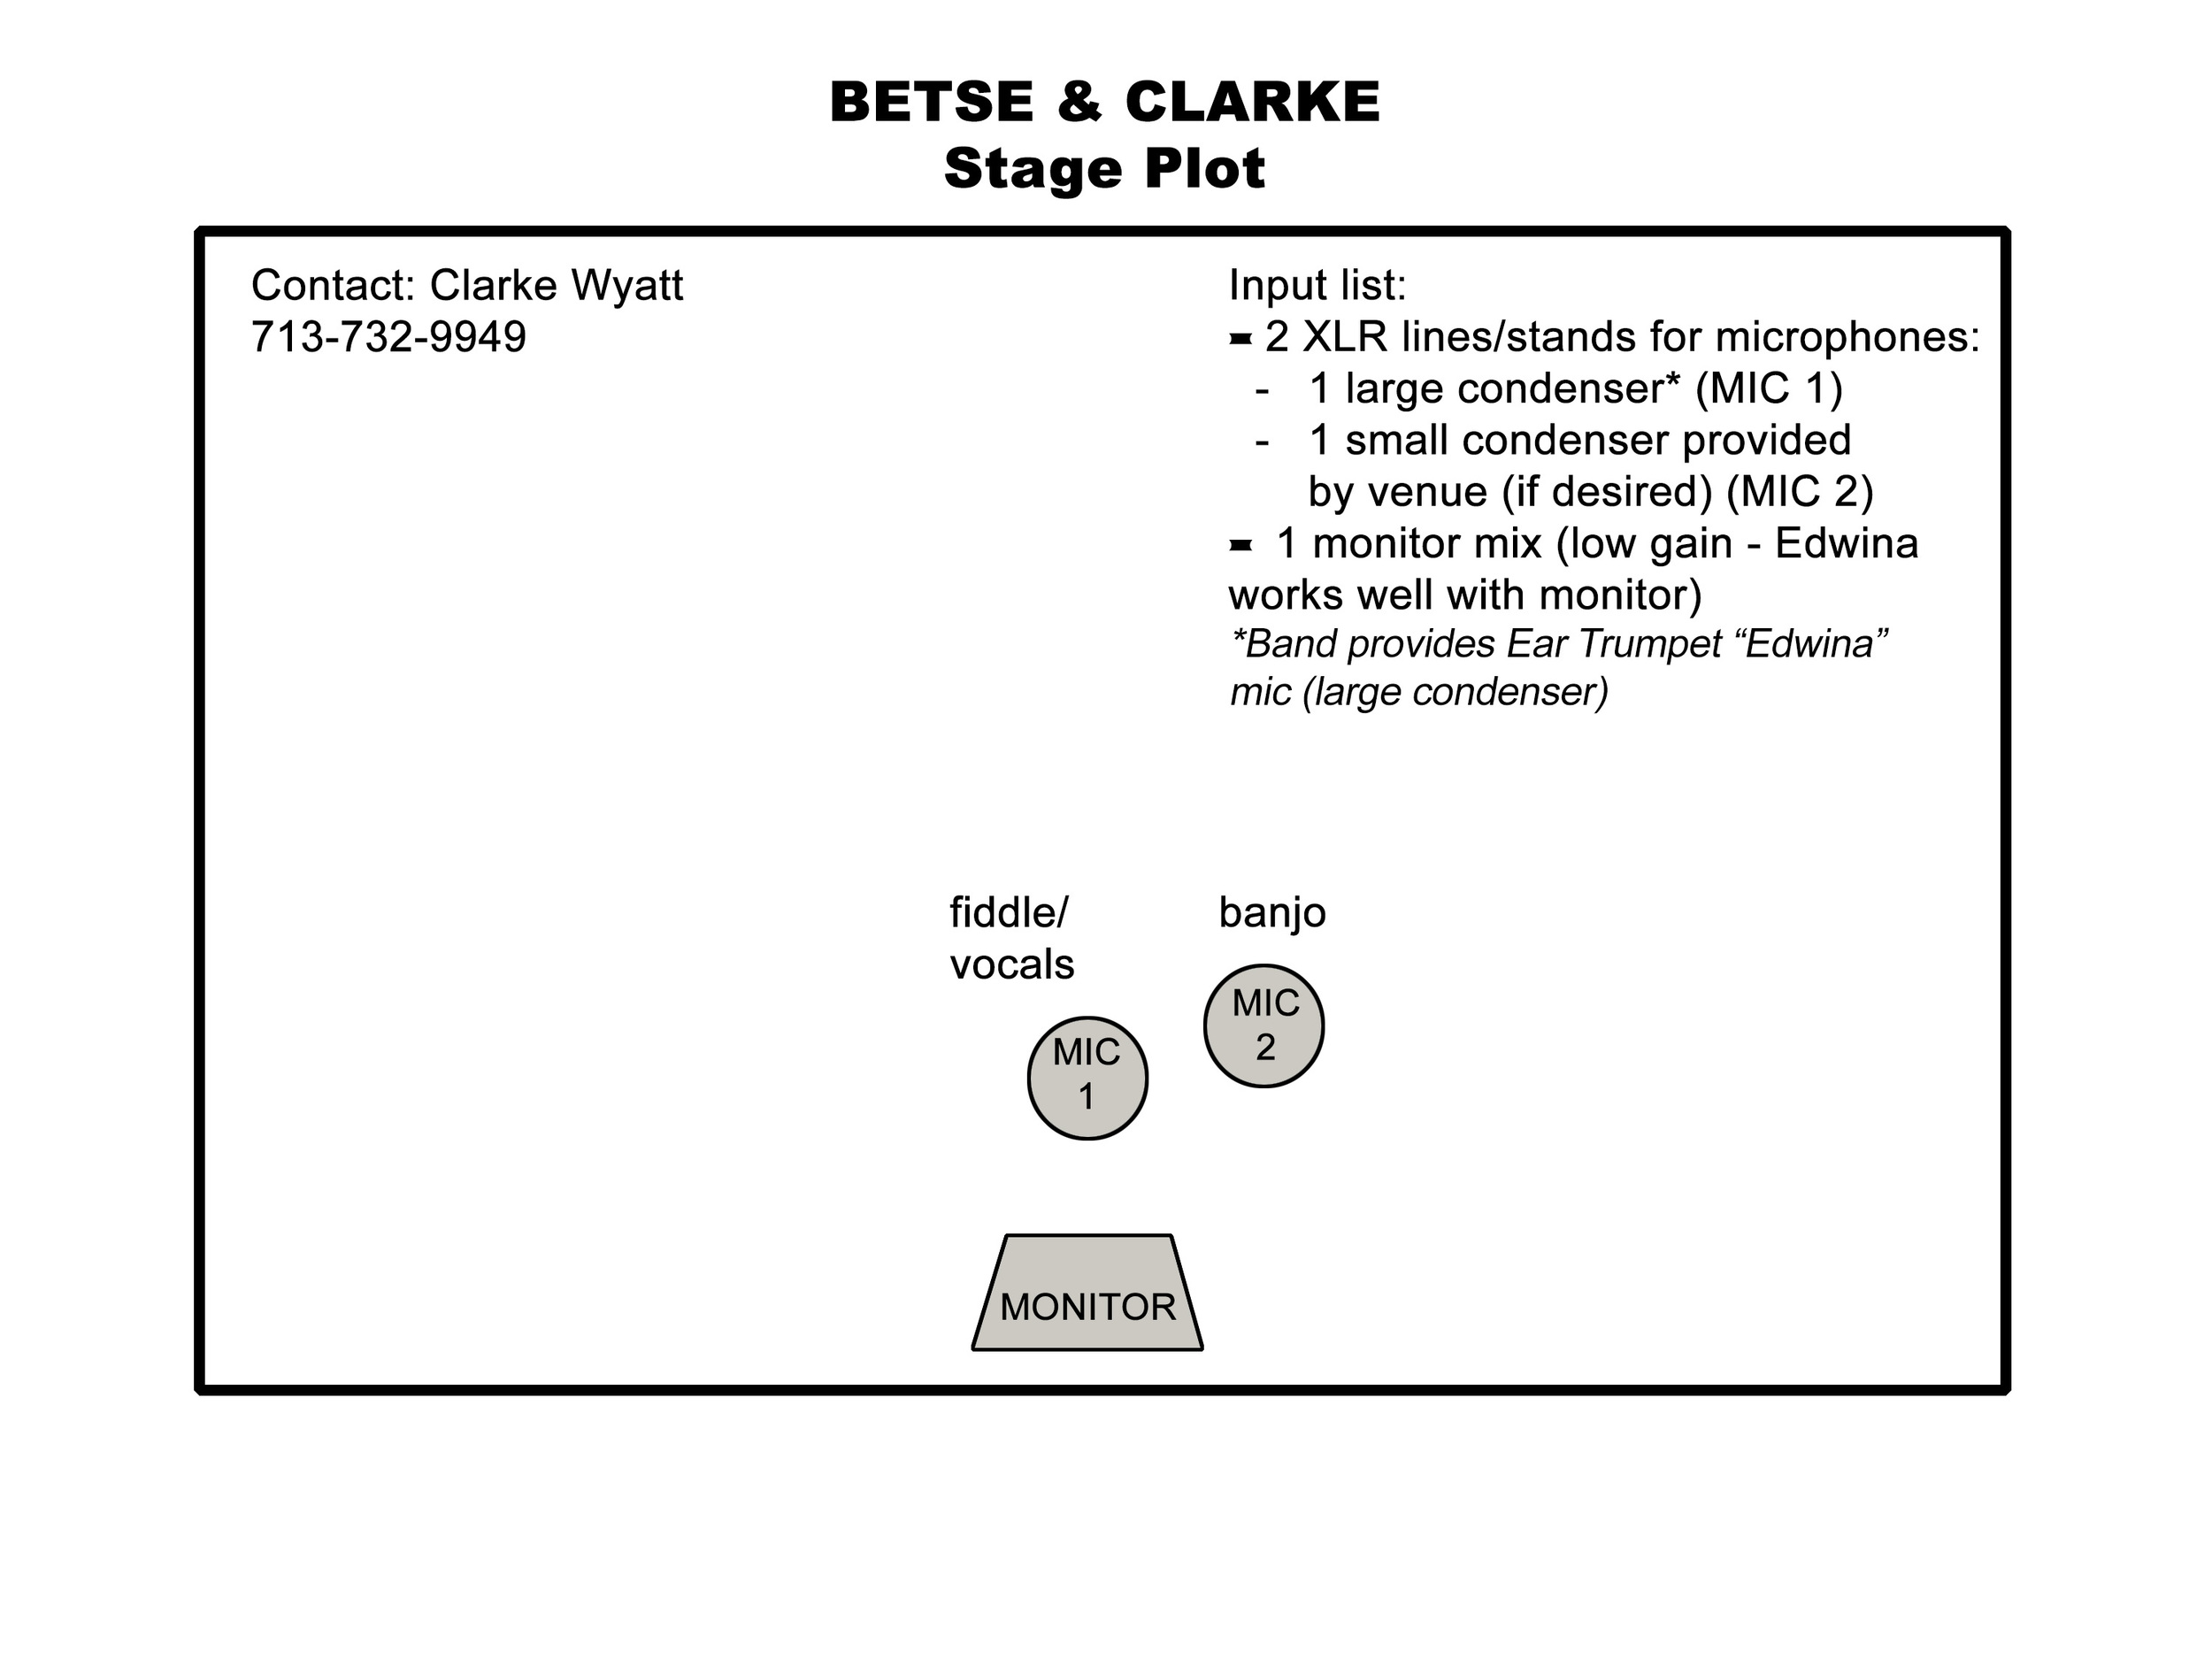 BetseClarke-stageplot.jpg